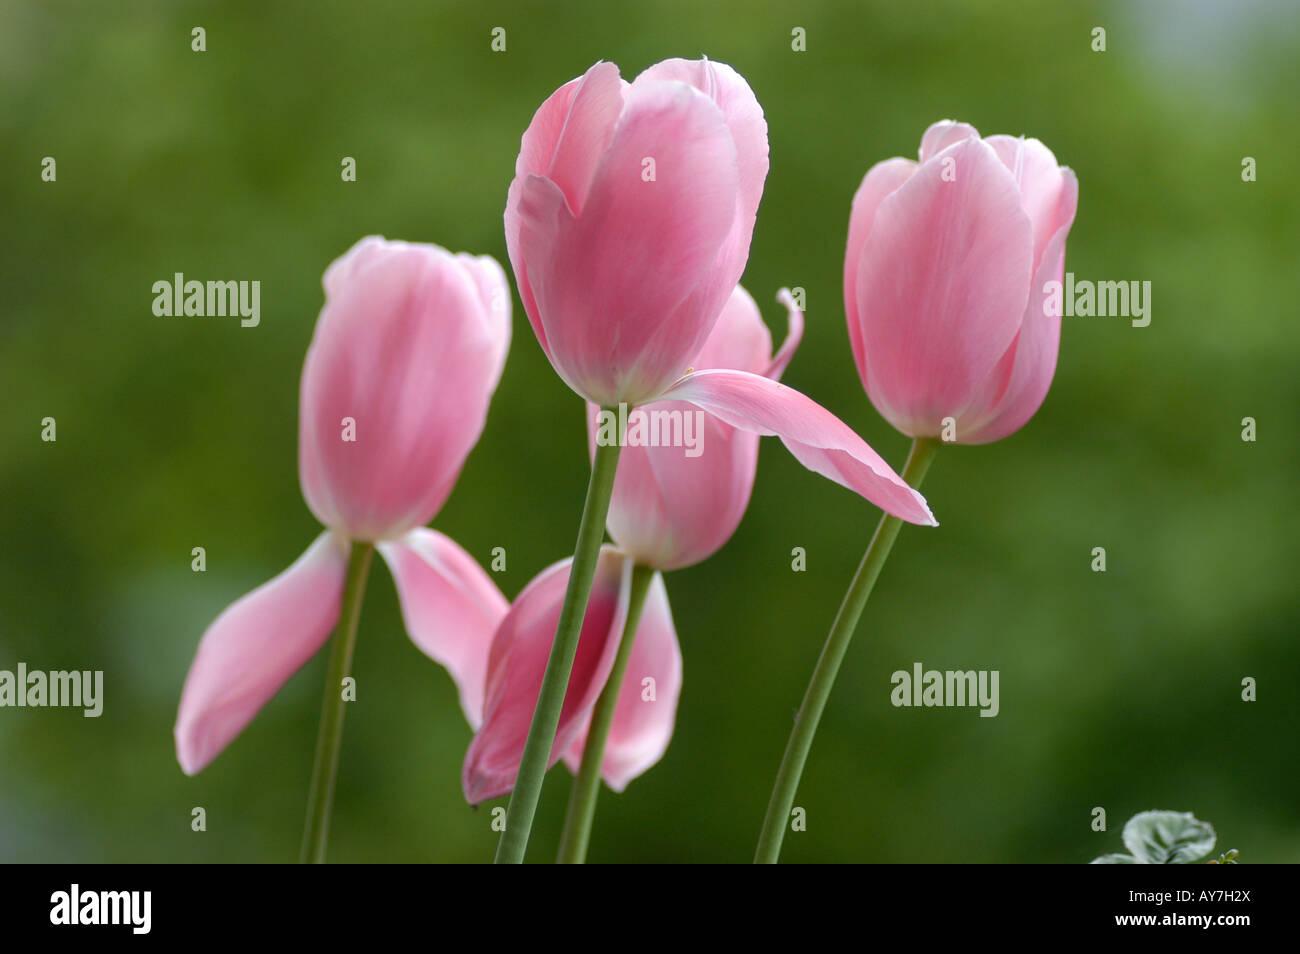 tulipa tulip delight flower stockfotos tulipa tulip delight flower bilder alamy. Black Bedroom Furniture Sets. Home Design Ideas